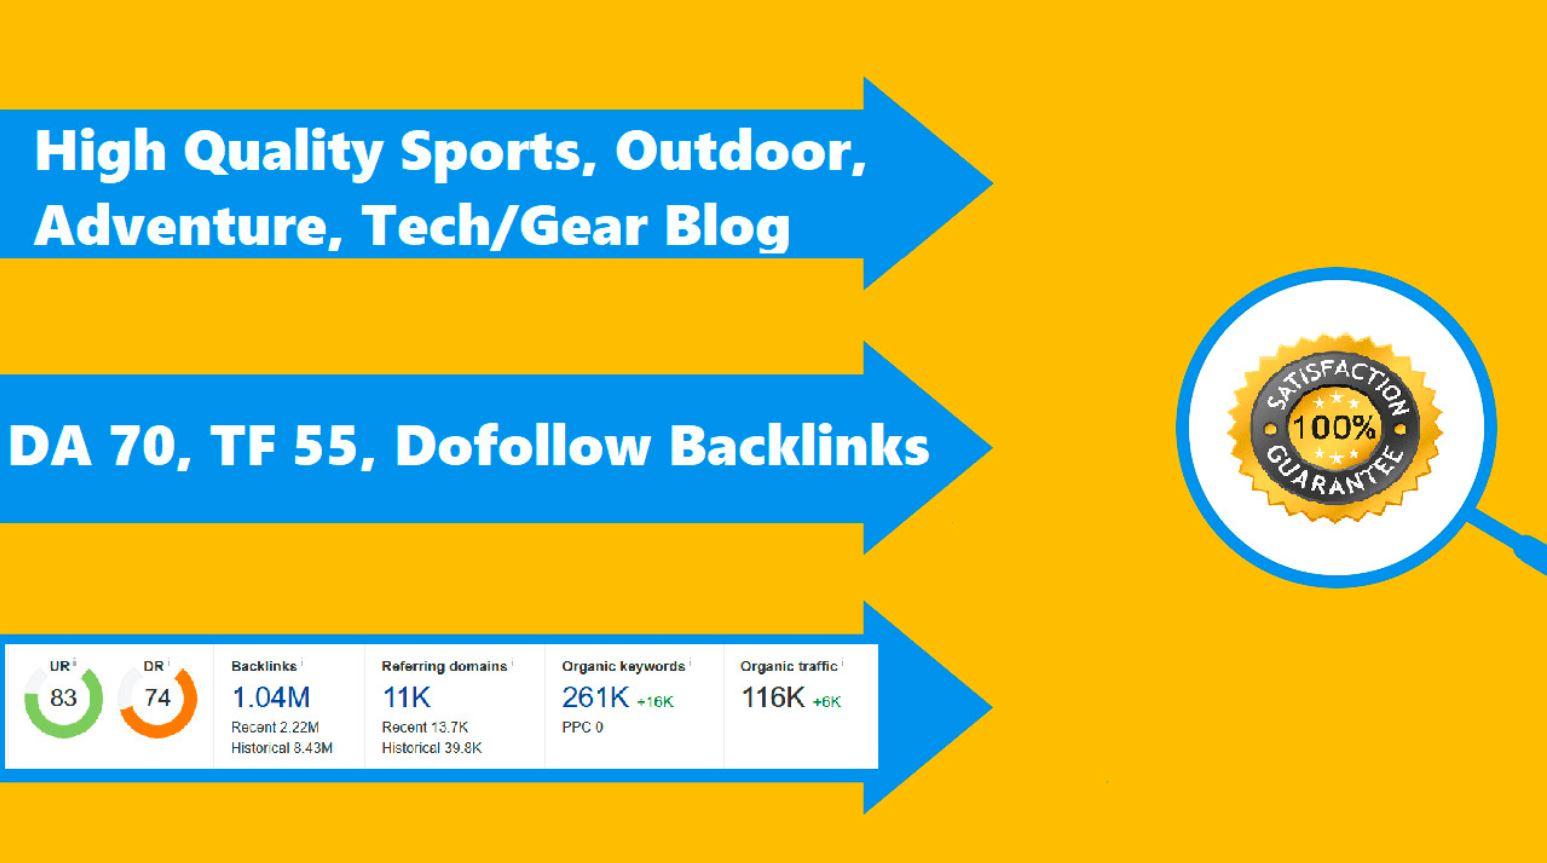 Write & Publish On DA70 Sports Blog Tetongravity